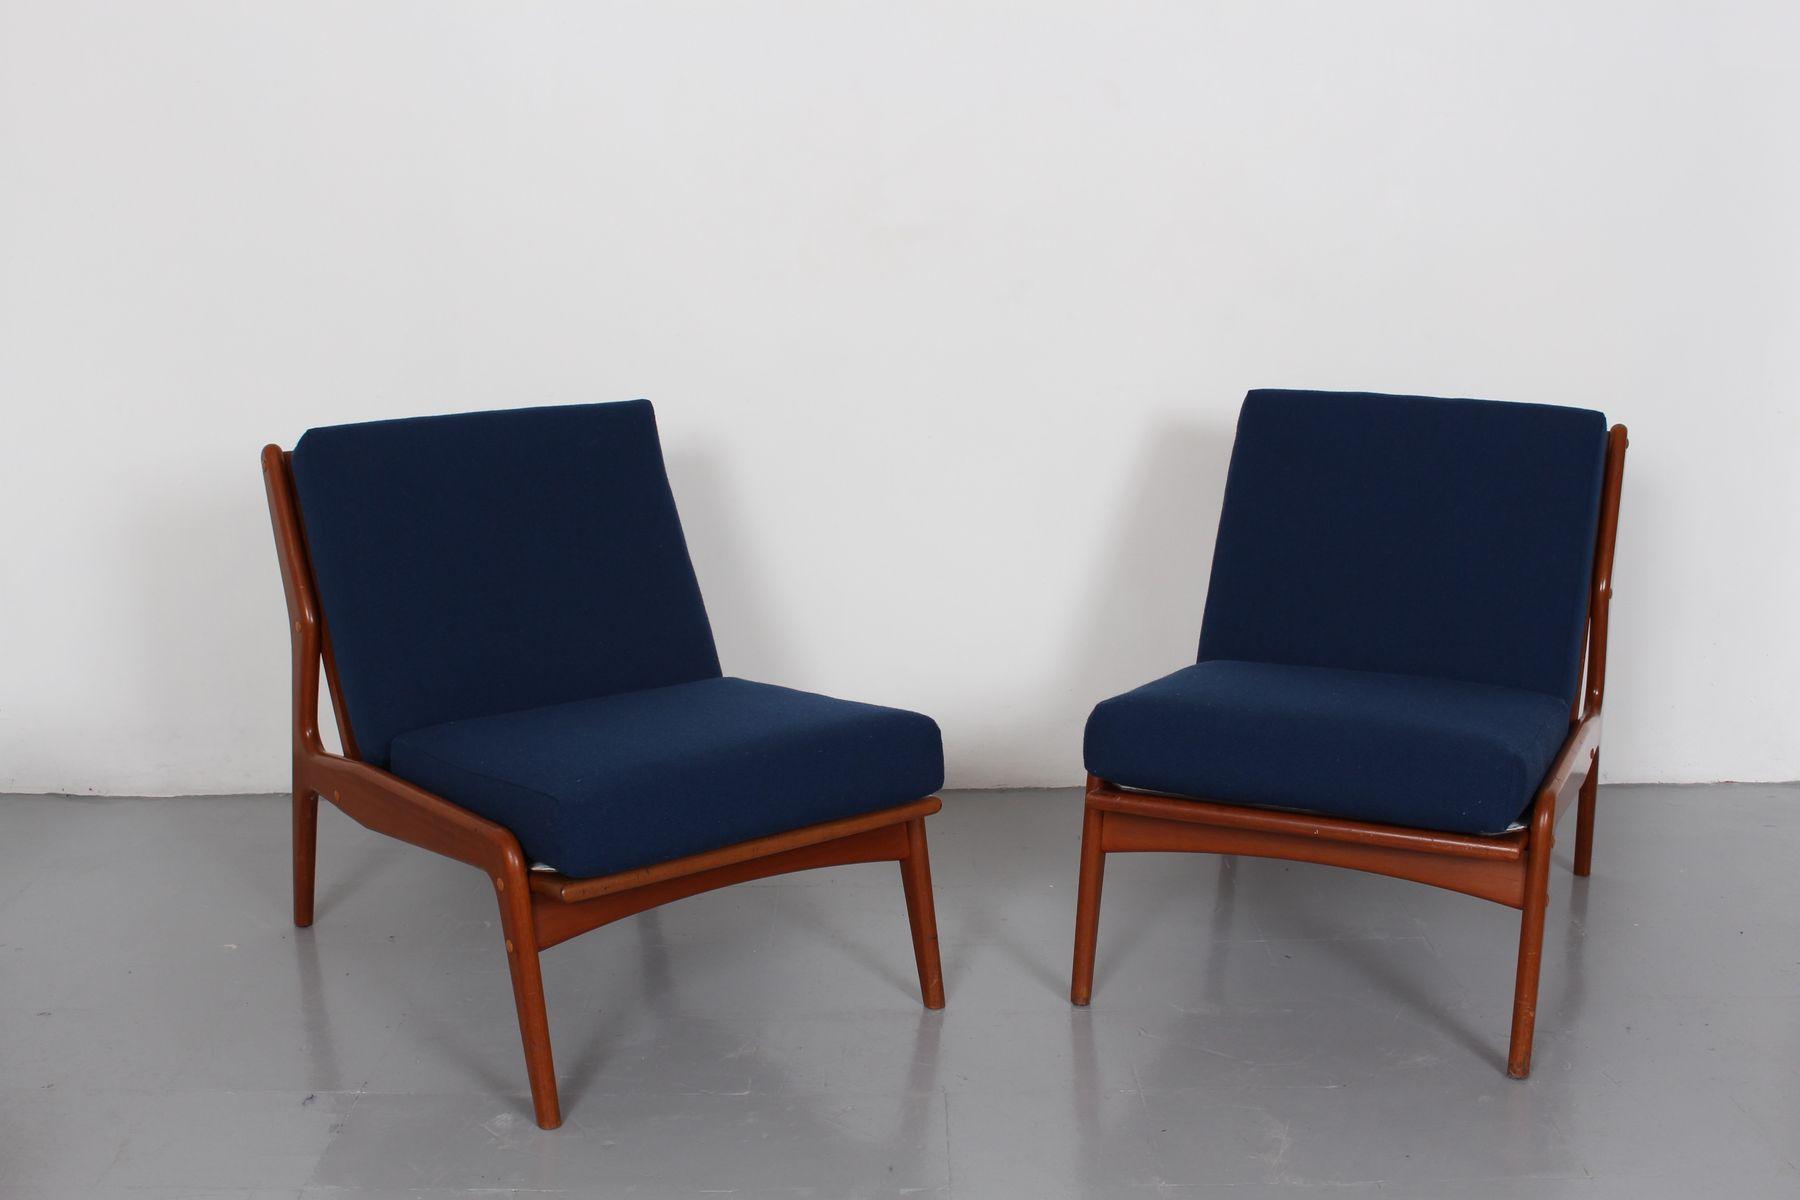 niedrige d nische vintage teak sessel mit blauem stoff 2er set bei pamono kaufen. Black Bedroom Furniture Sets. Home Design Ideas